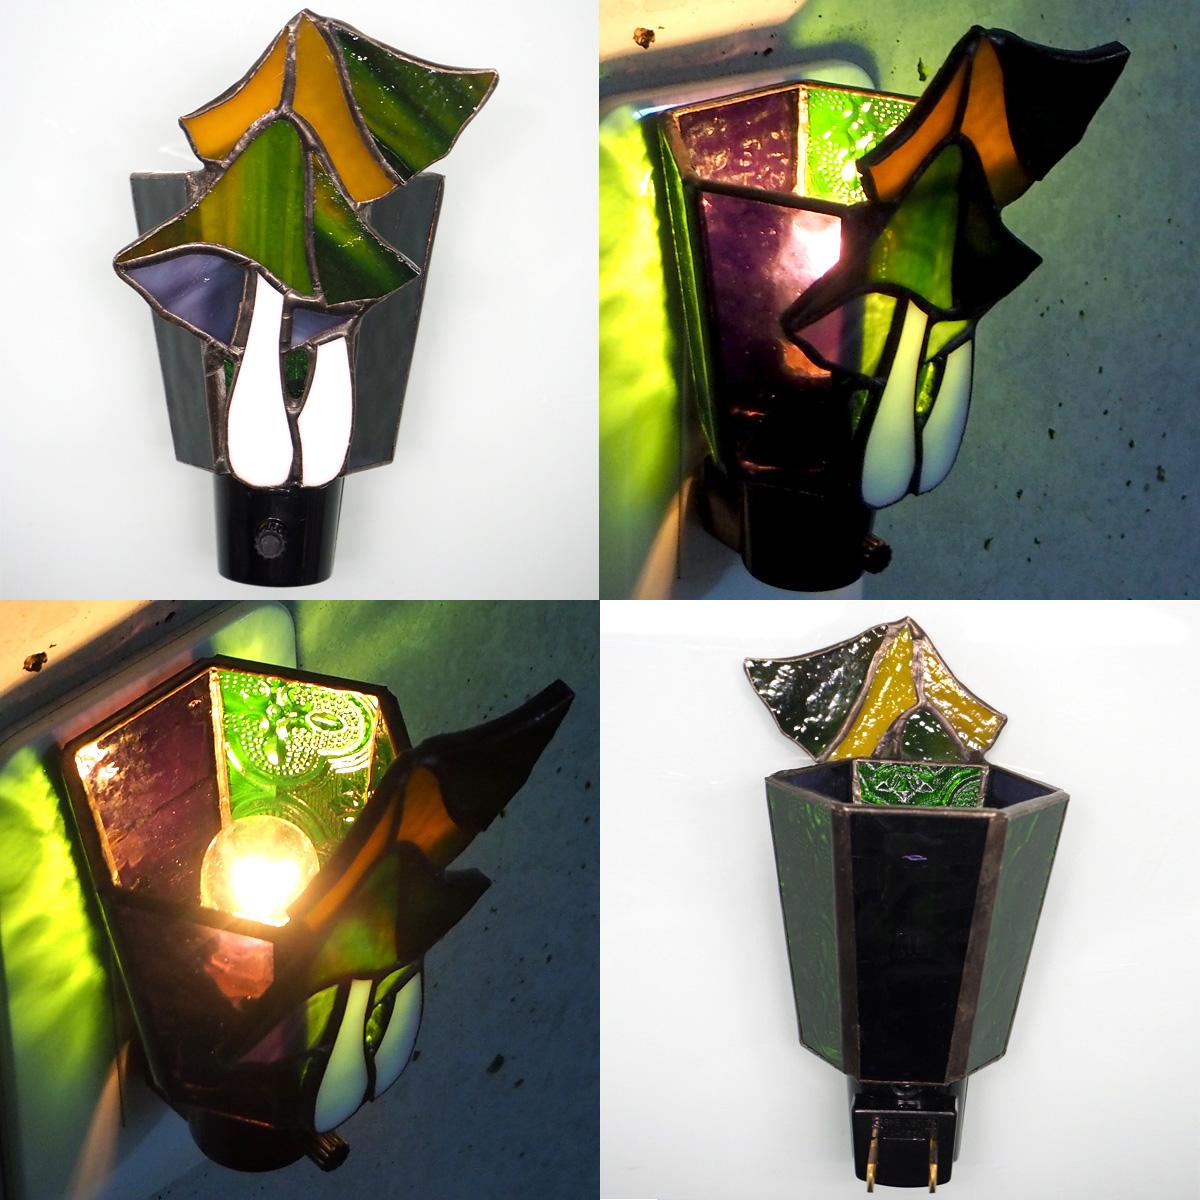 matilde (マチルダ) ステンドグラス照明 コンセント直結ライト きのこ グリーン